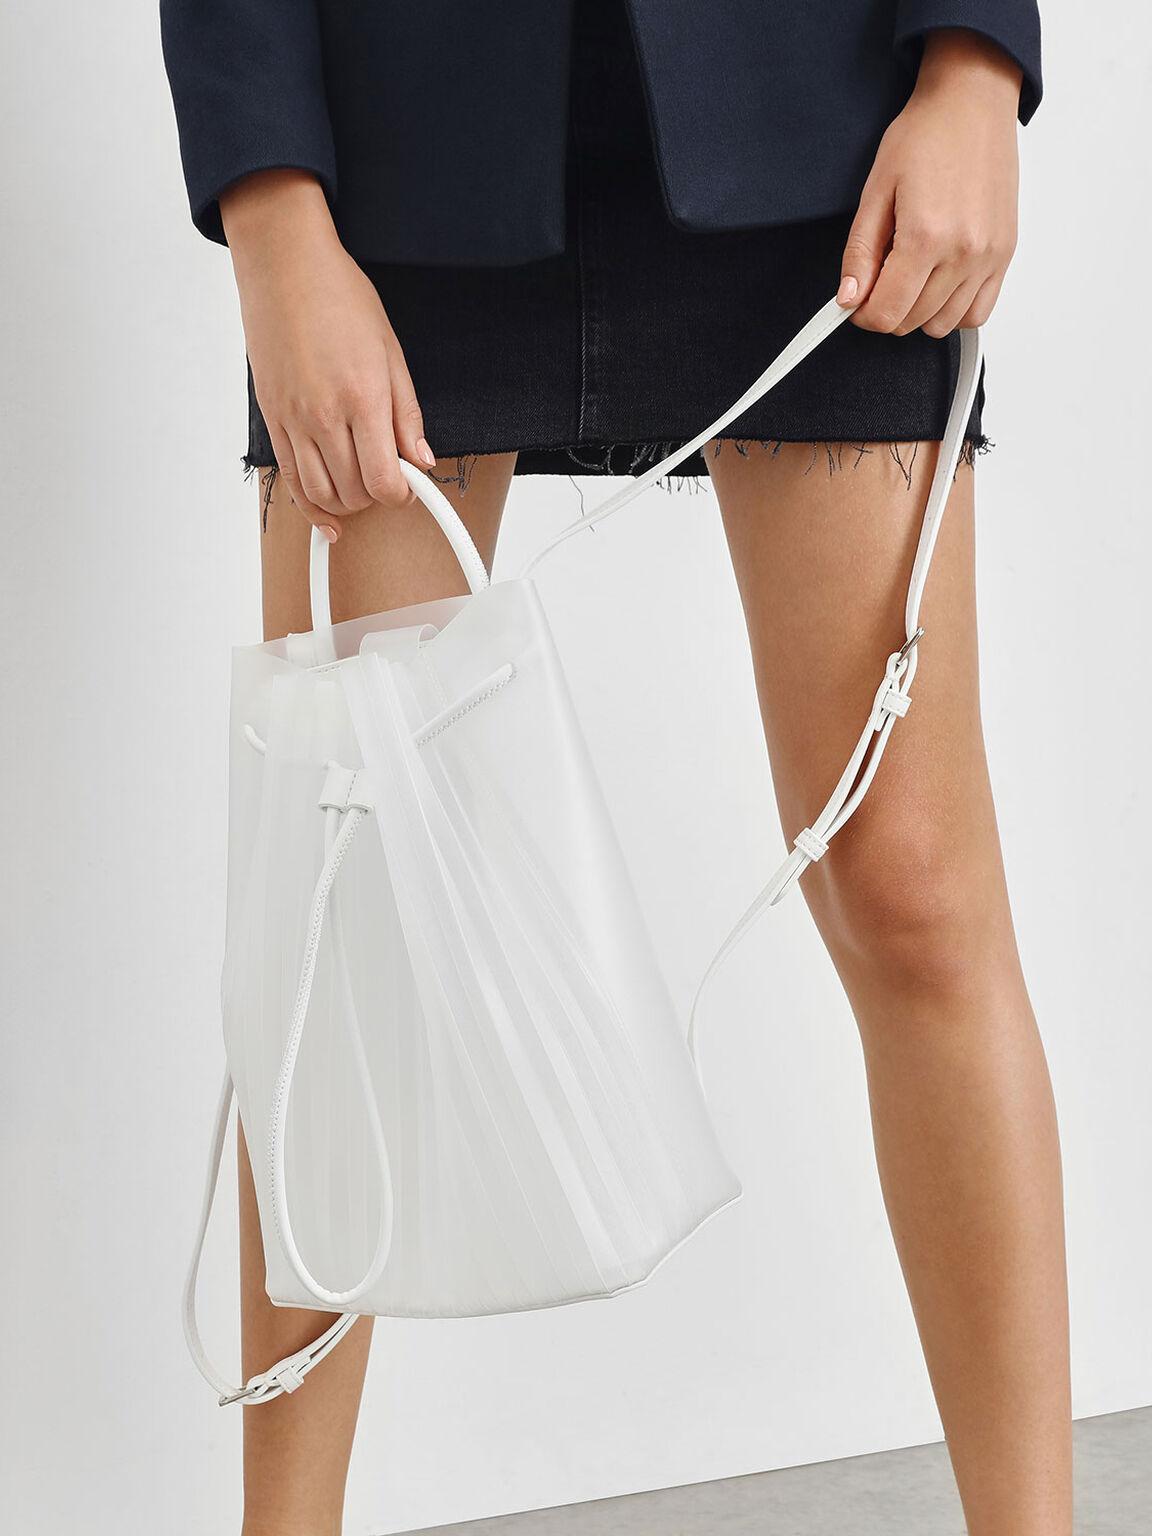 Translucent Drawstring Backpack, White, hi-res